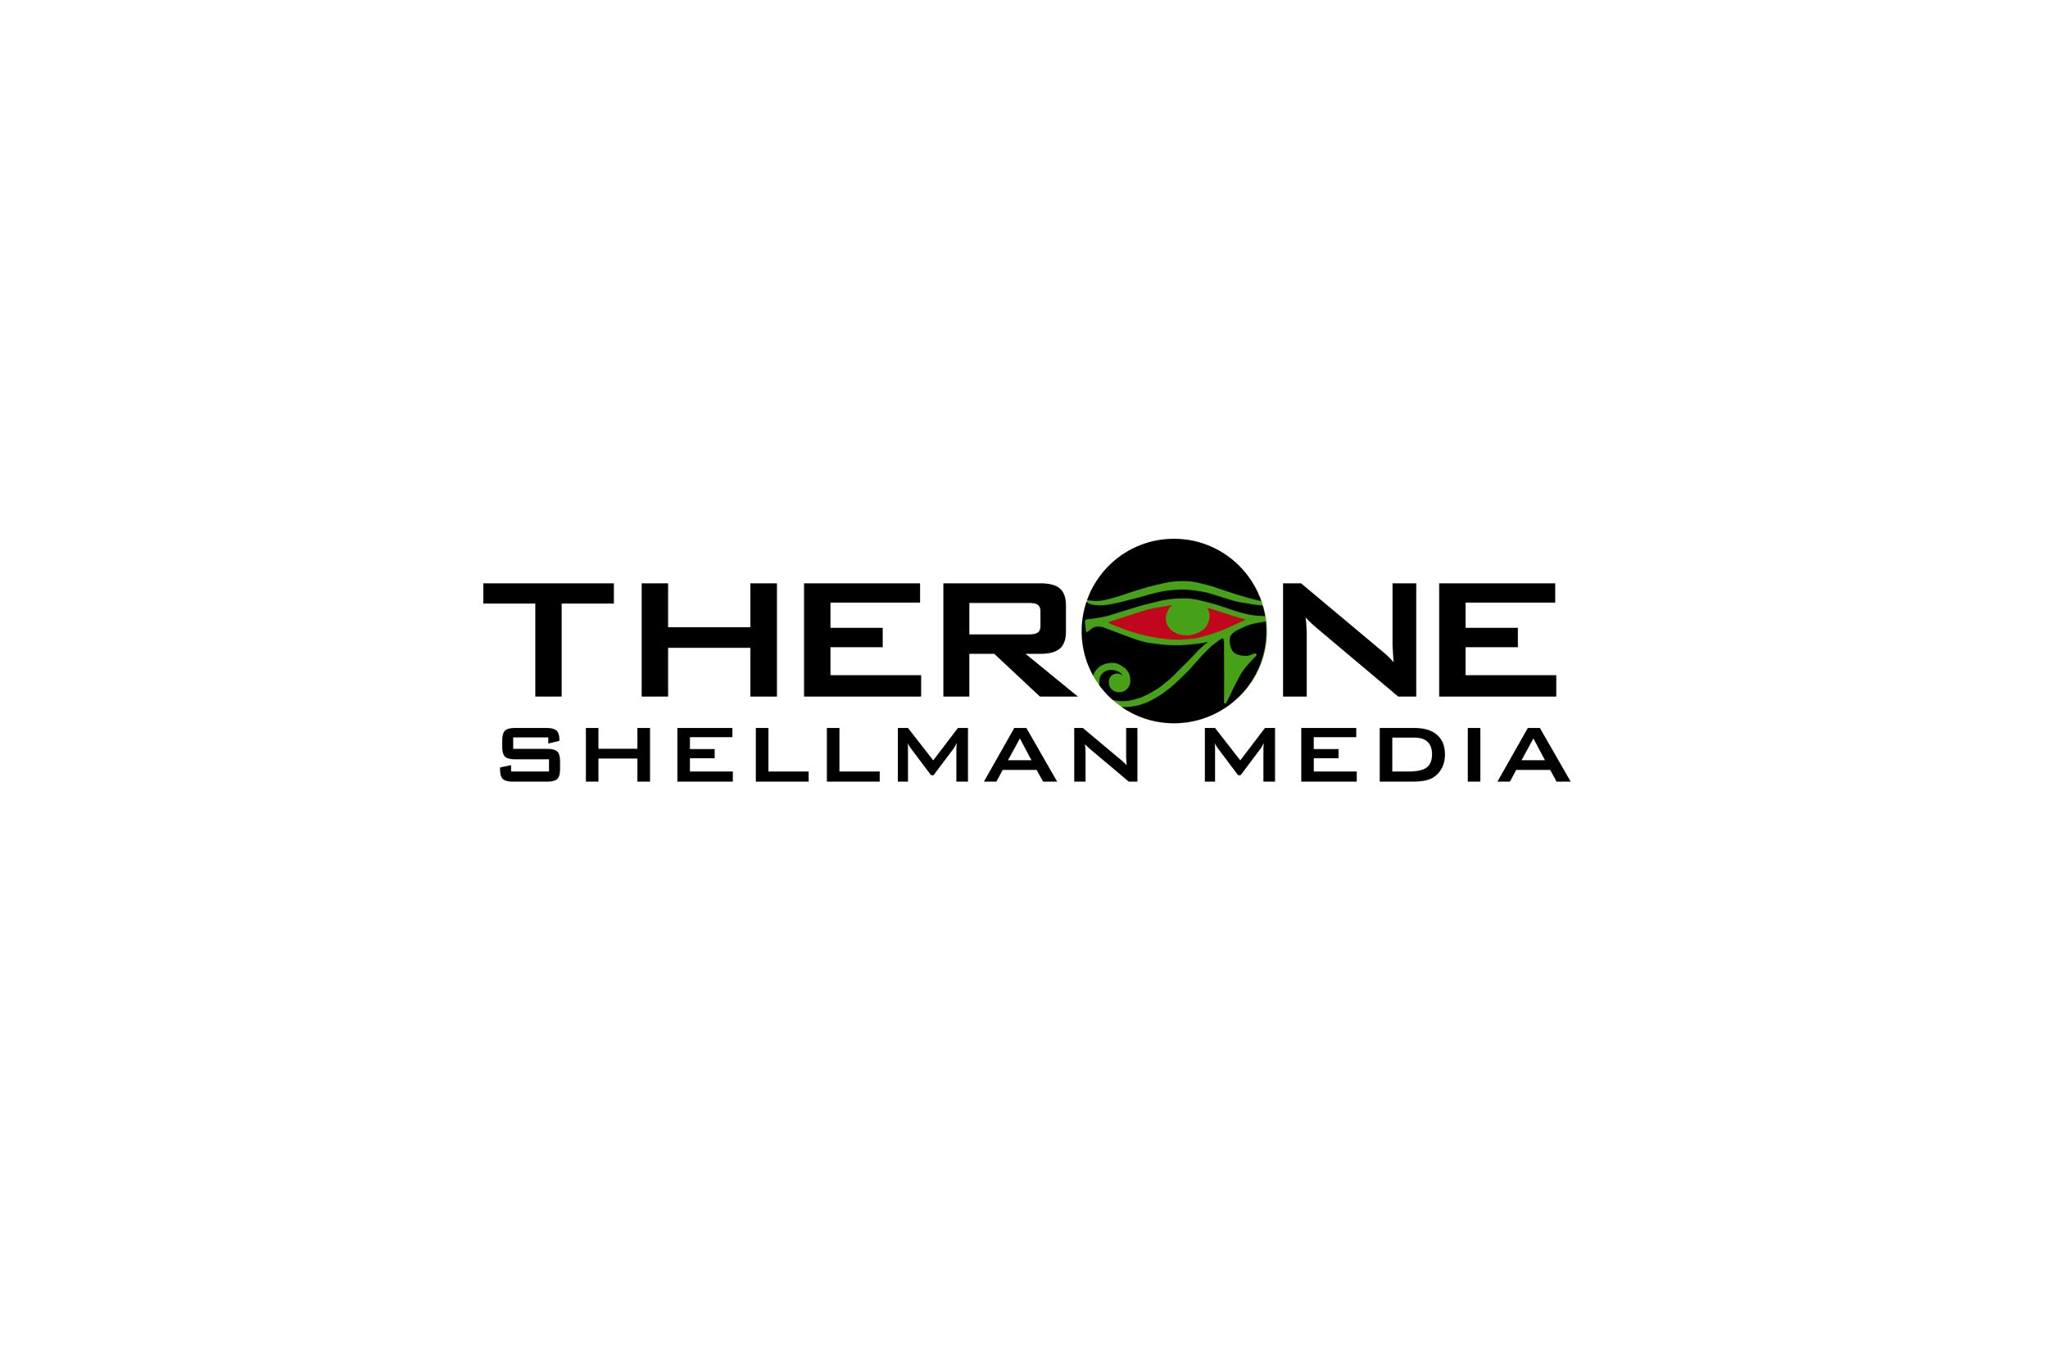 Theroneshellmanmedialogo